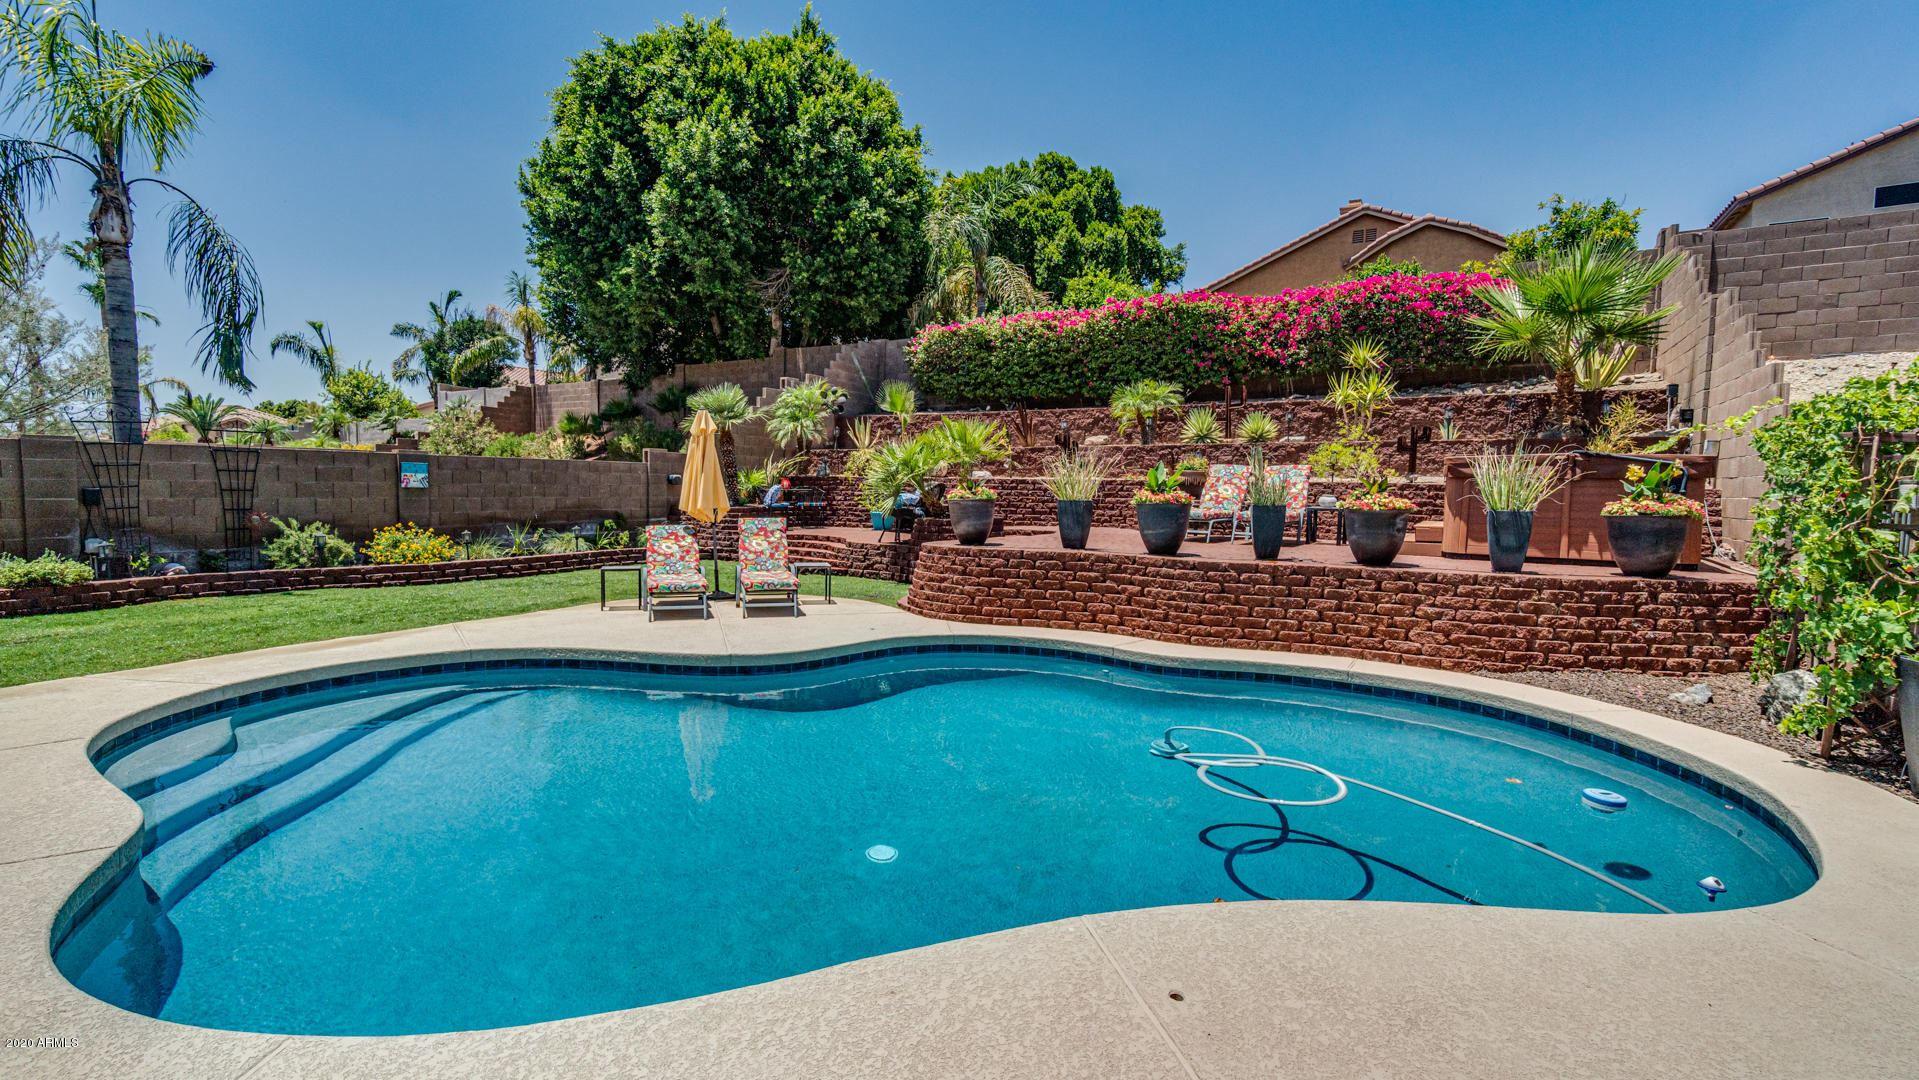 16034 S 10TH Street, Phoenix, AZ 85048 - MLS#: 6088355